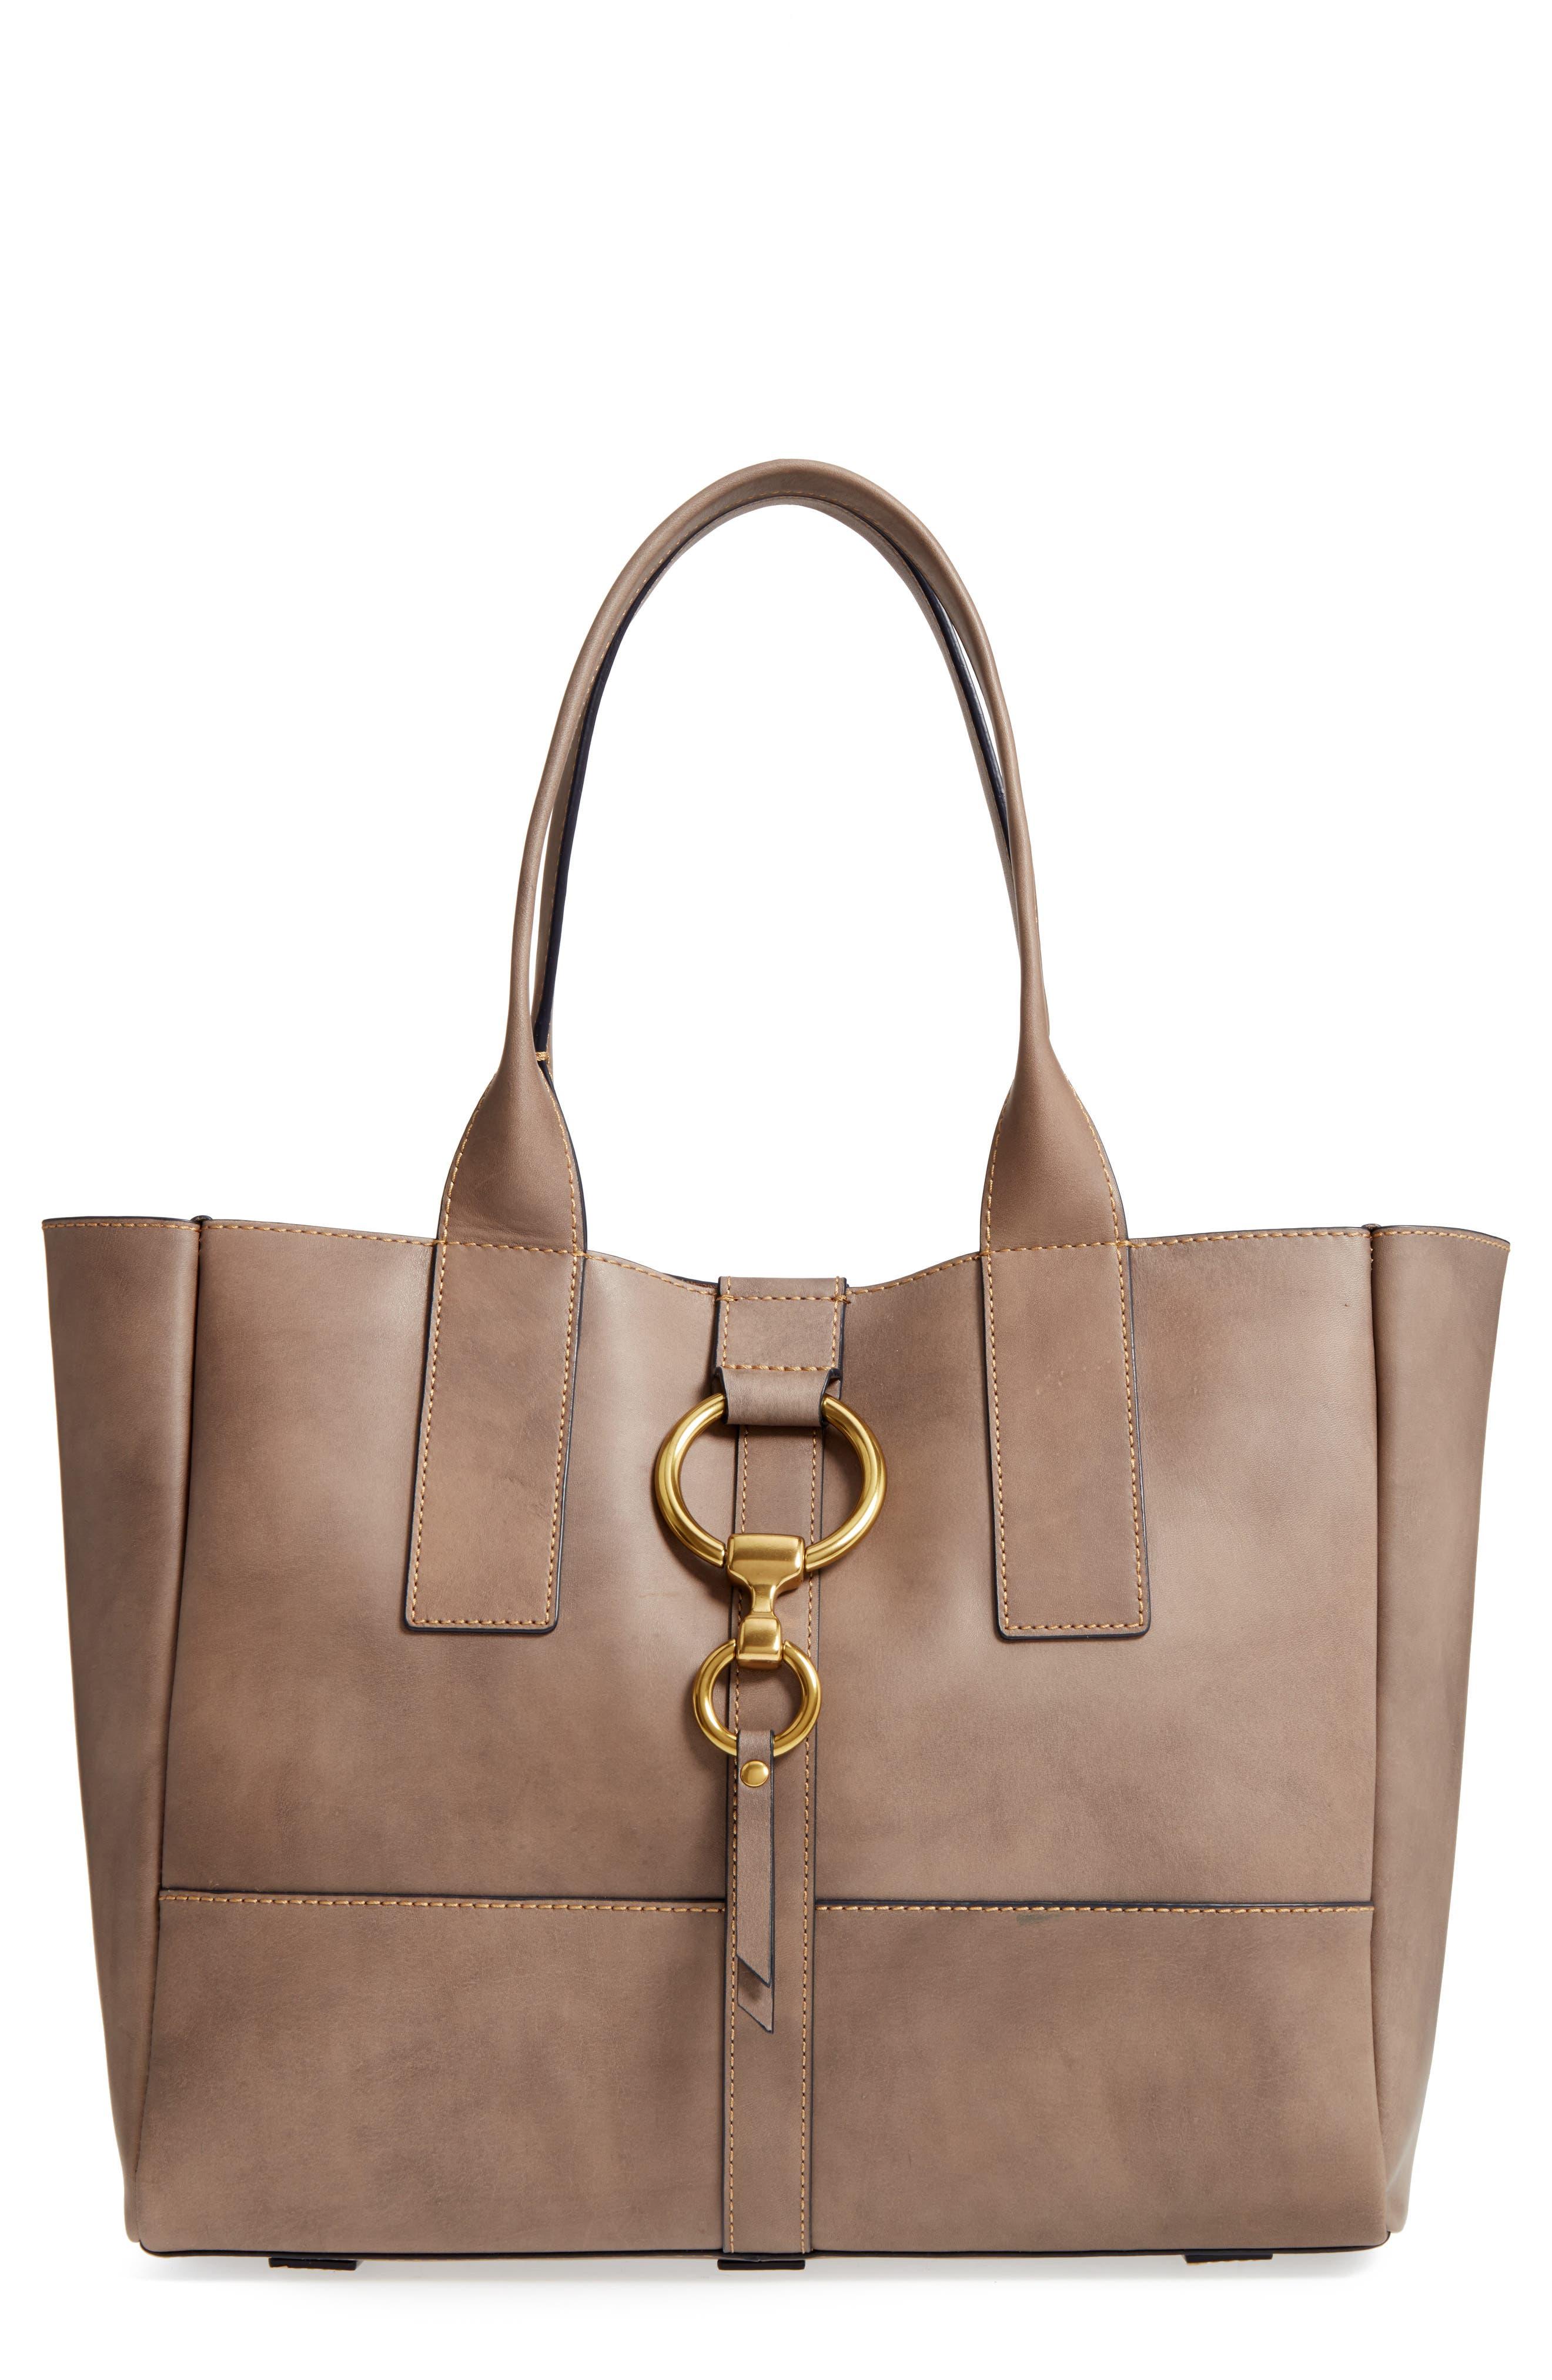 Ilana Harness Leather Shopper,                         Main,                         color, 030